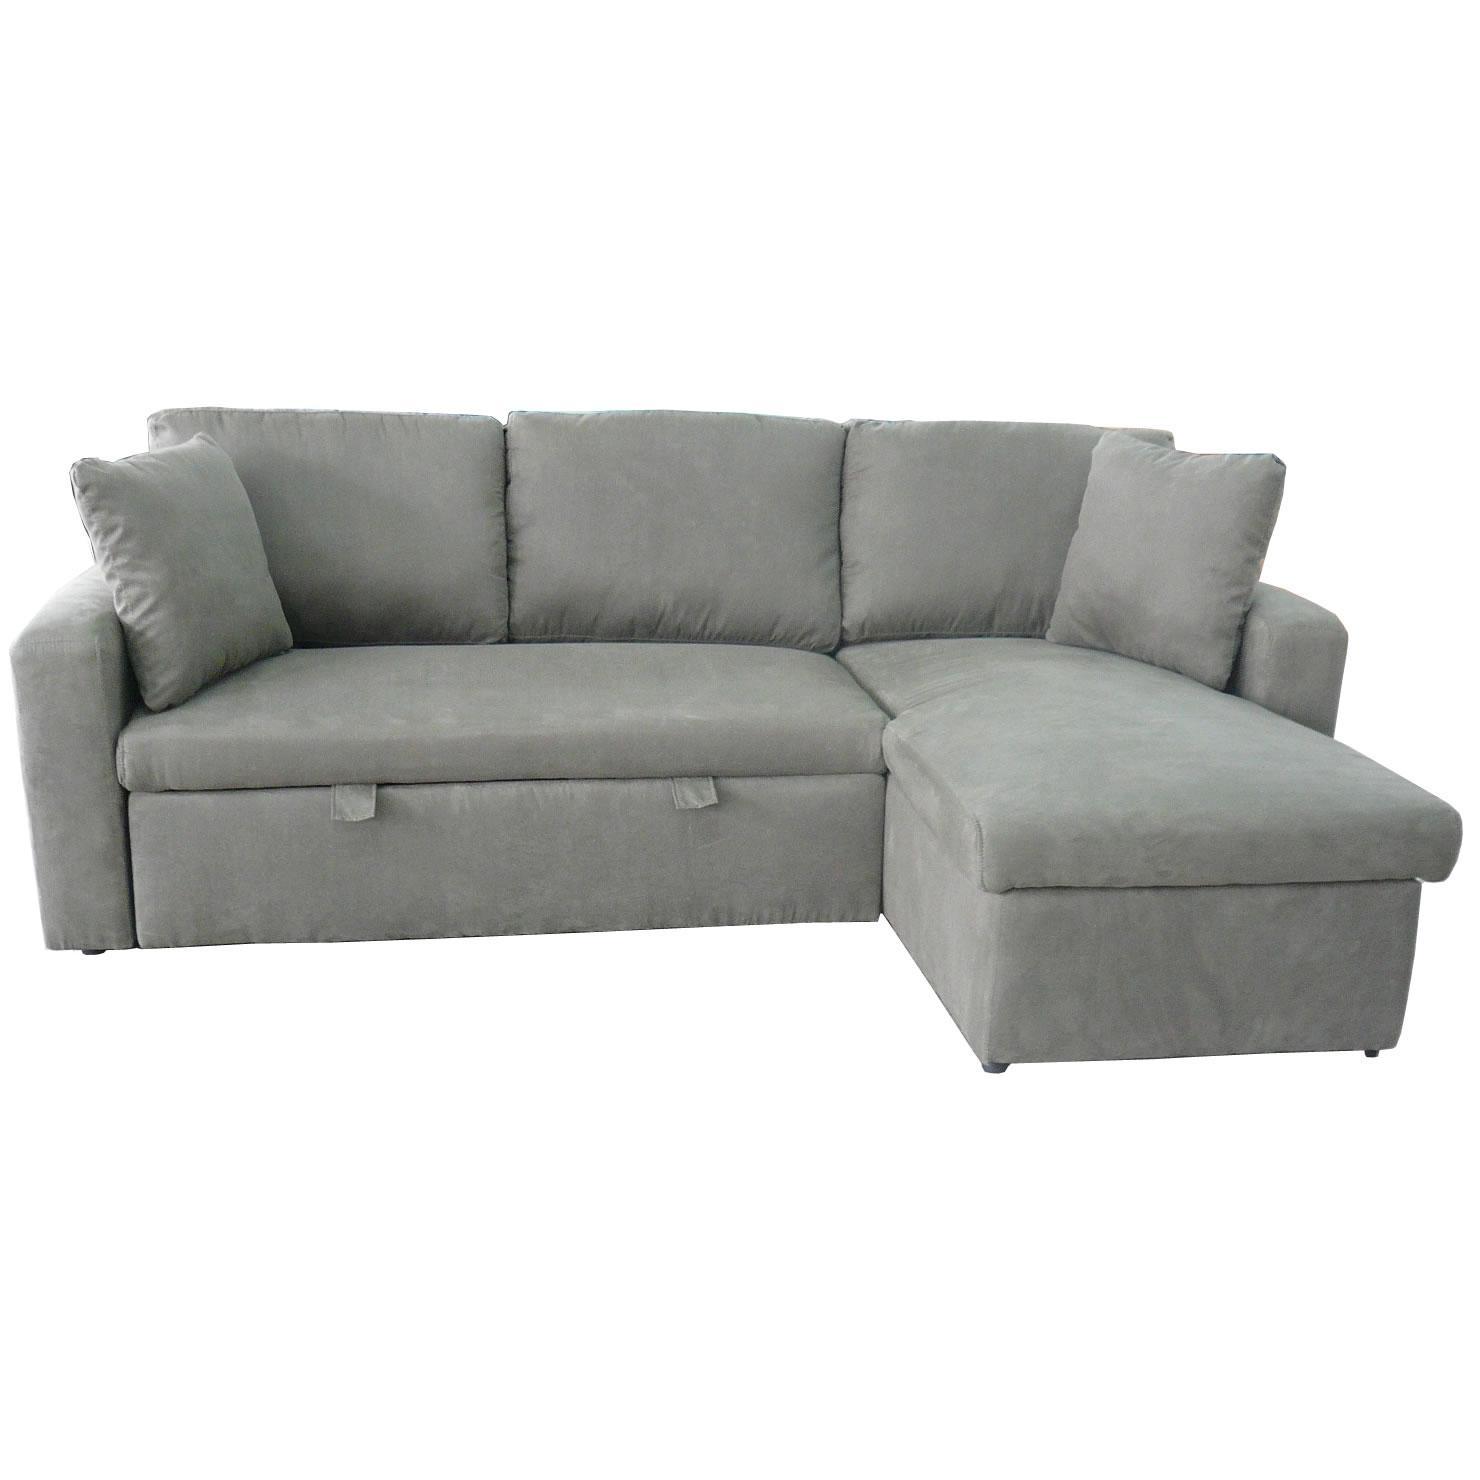 Corner Unit Sofa Beds With Storage   Centerfieldbar Throughout Sofa Corner Units (Image 4 of 24)